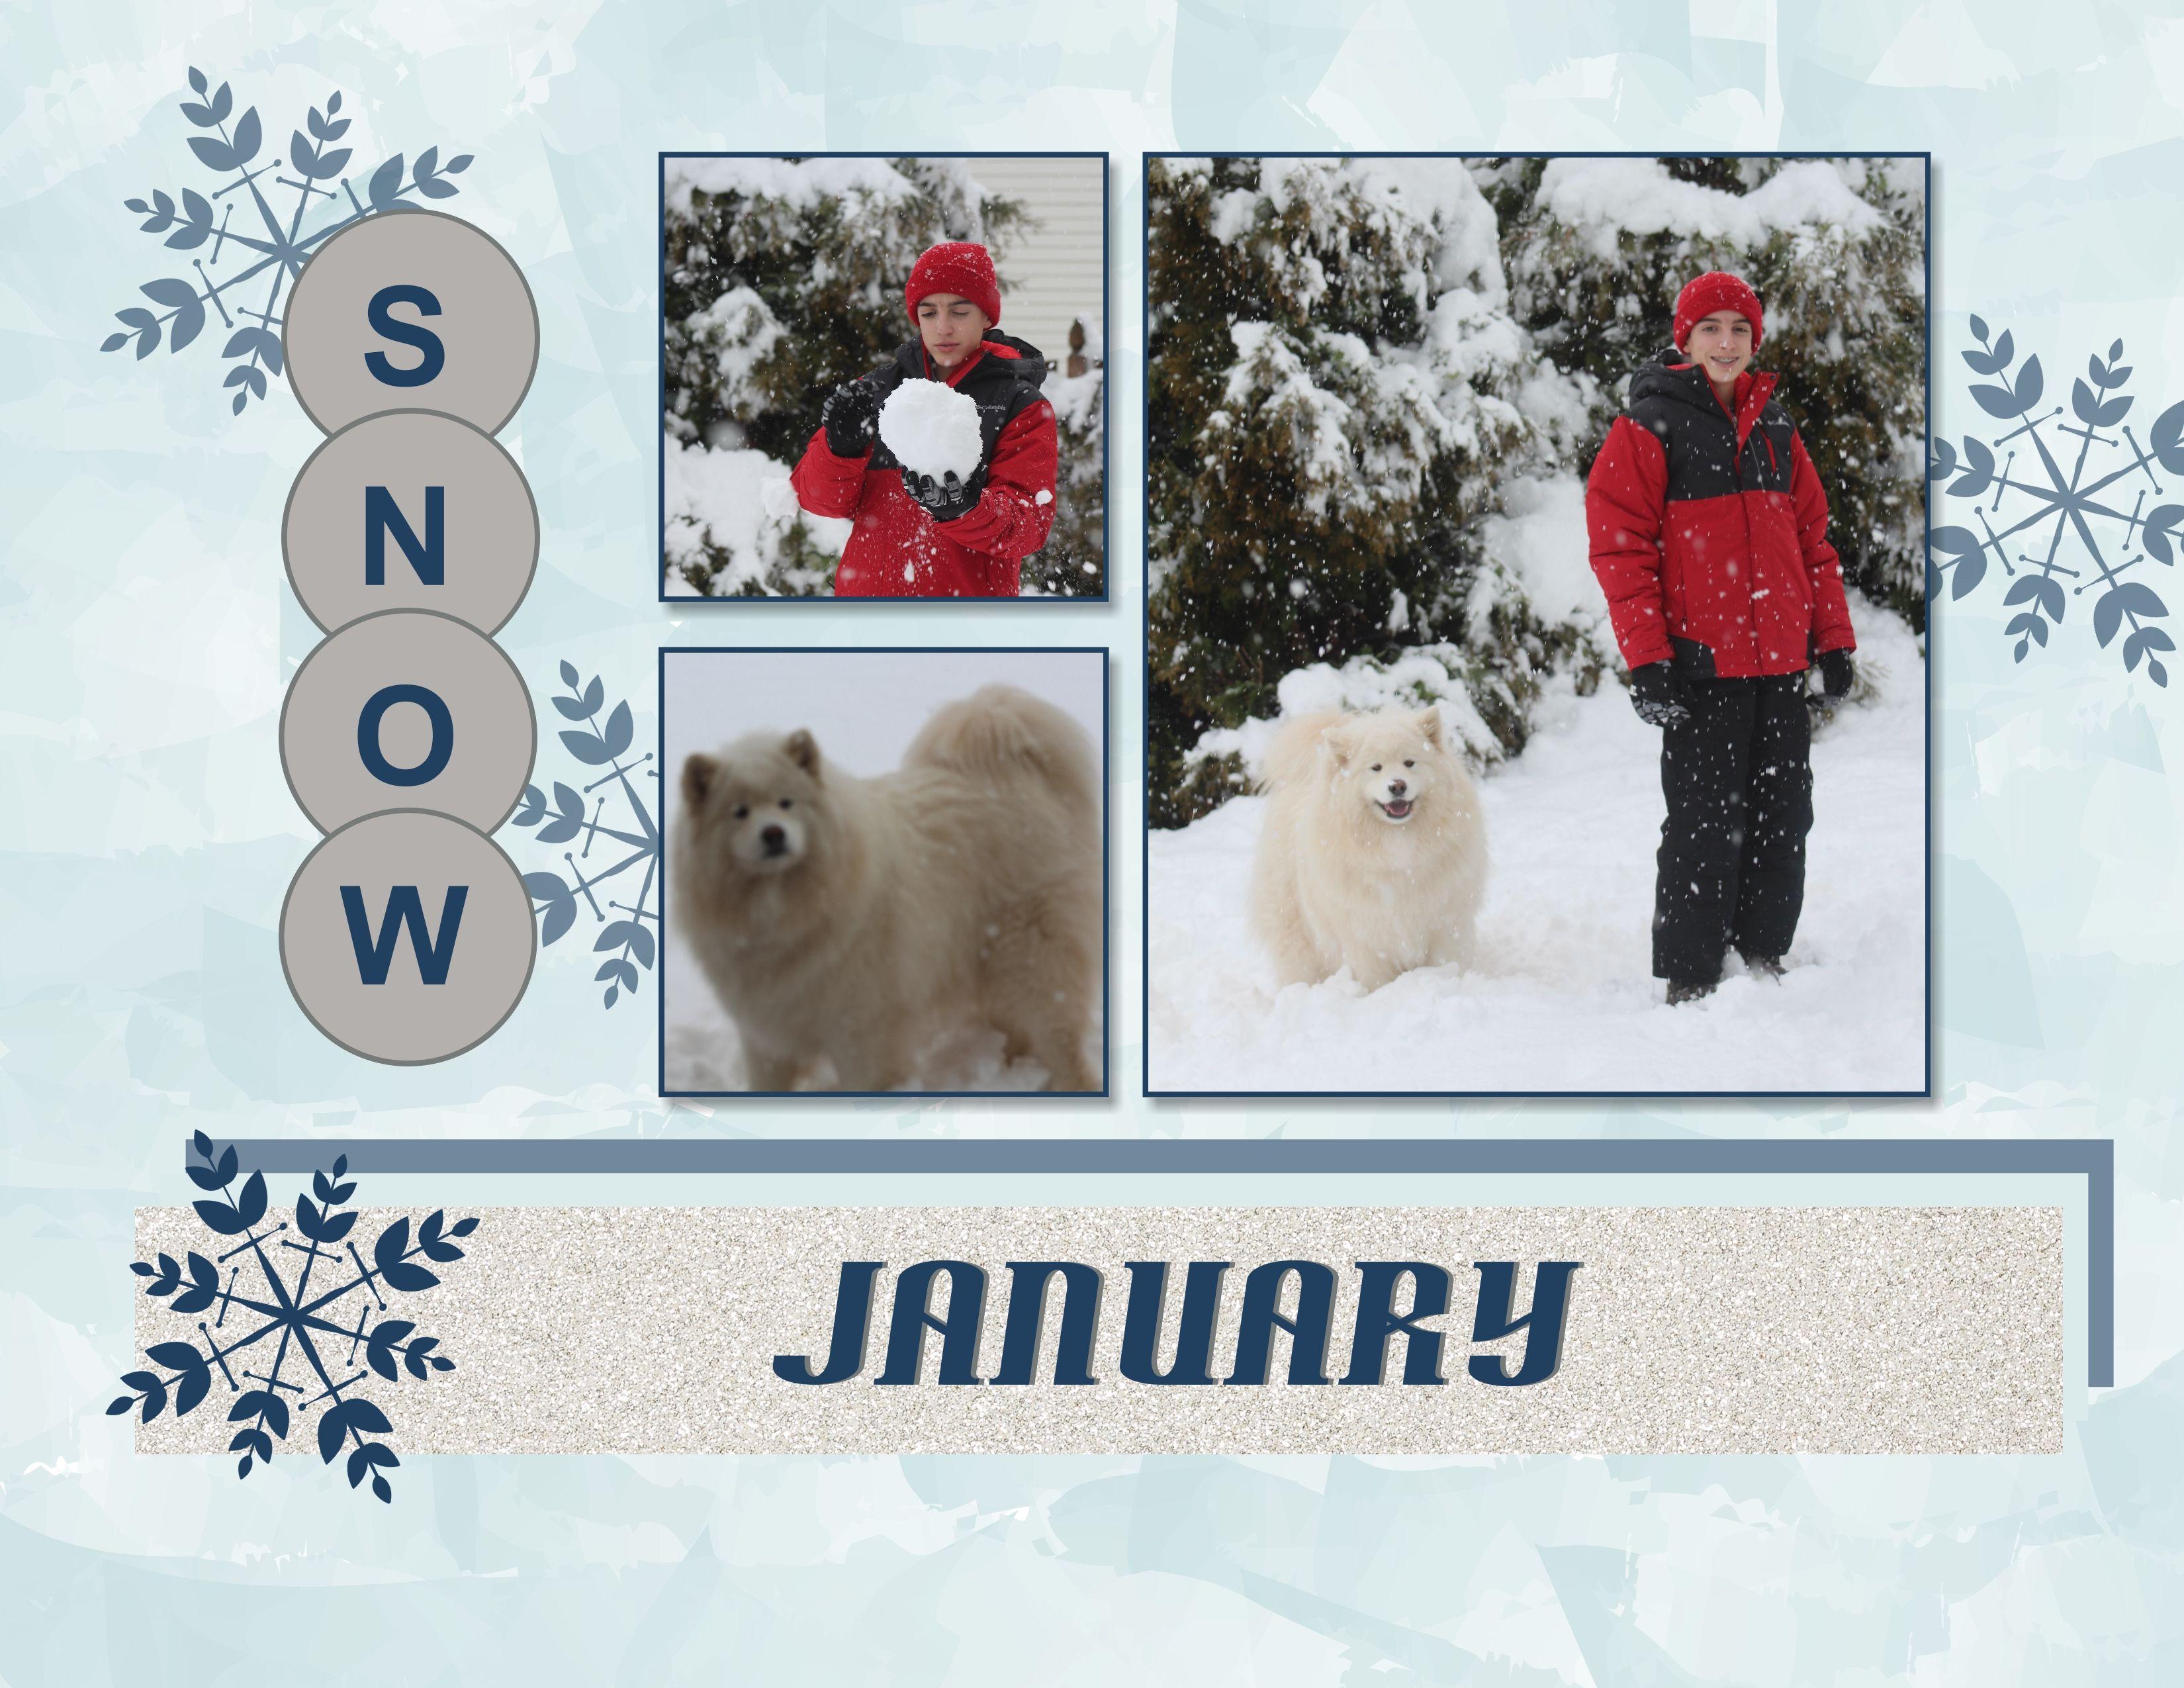 January 2015 Calendar Page created by Kelly DeTommaso. http://kellyscreativecorner.com/2014/12/05/my-2015-calendar/   #stampinup #stampin' #up! #MDS #MyDigitalStudio #homemade calendars #digitalscrapbooking #scrapbooking